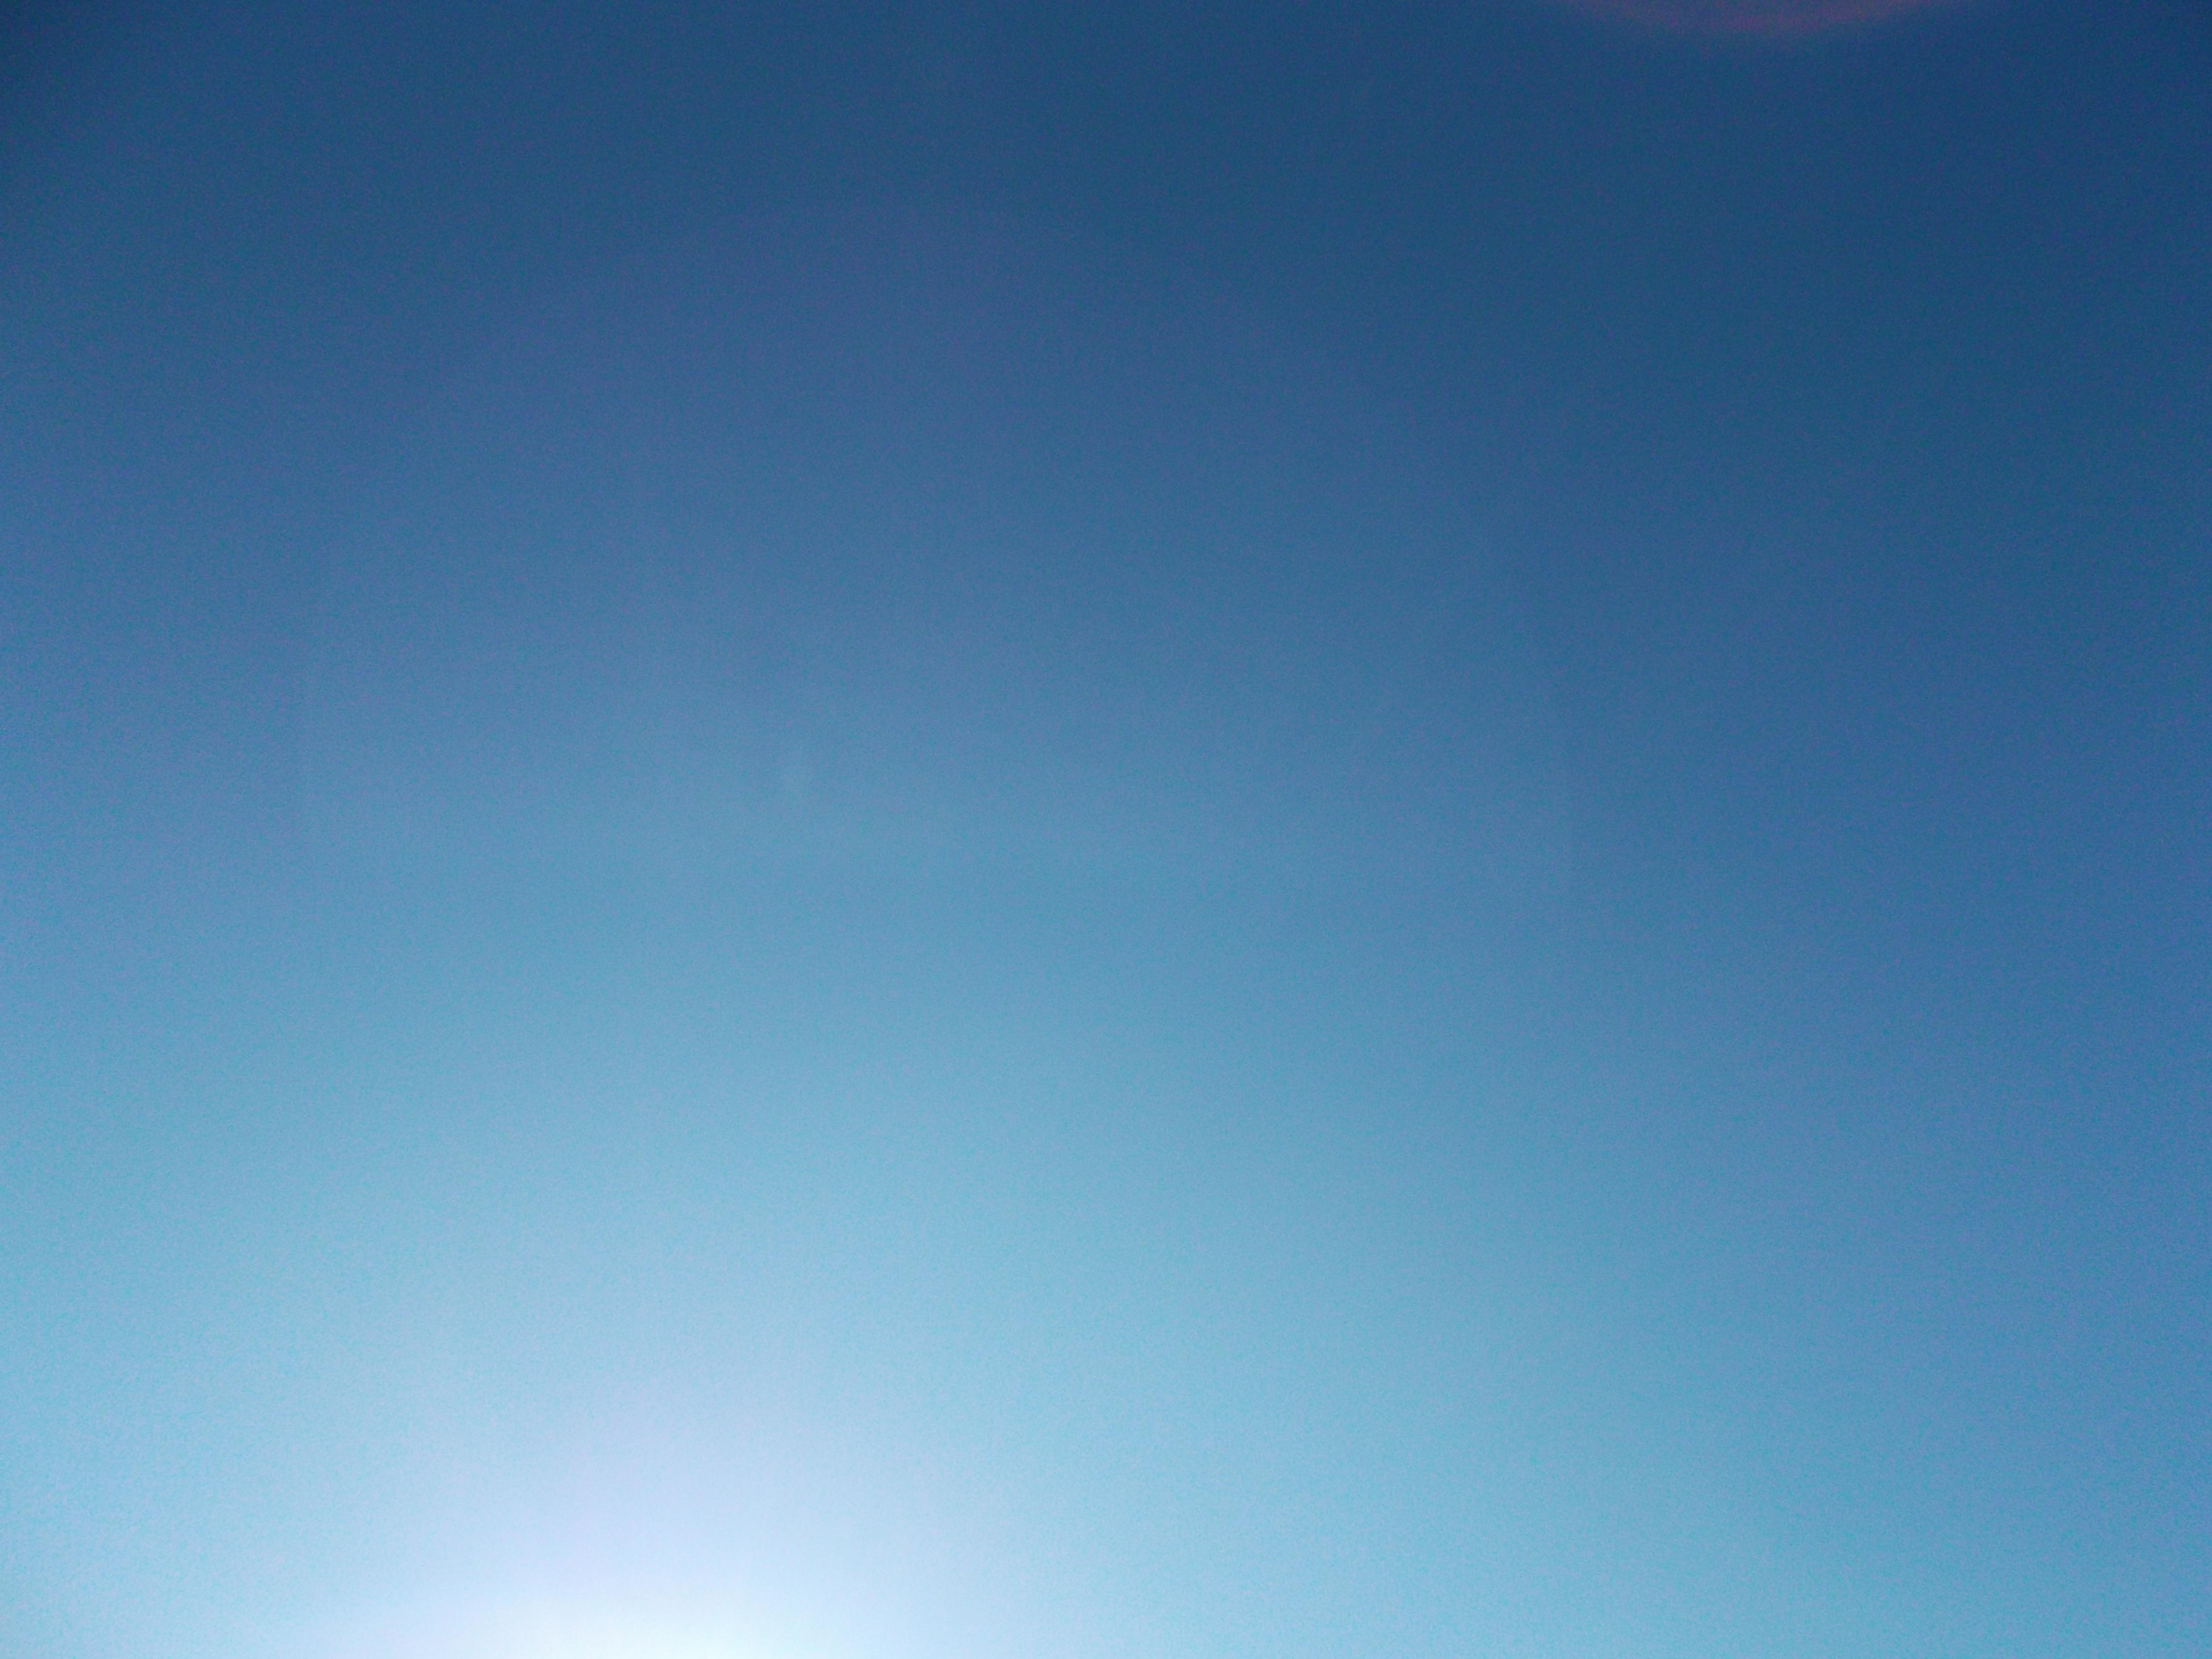 2013-05-03 Longitude -0.371 Latitude 49.182 Altitude 29 Heure 16h28